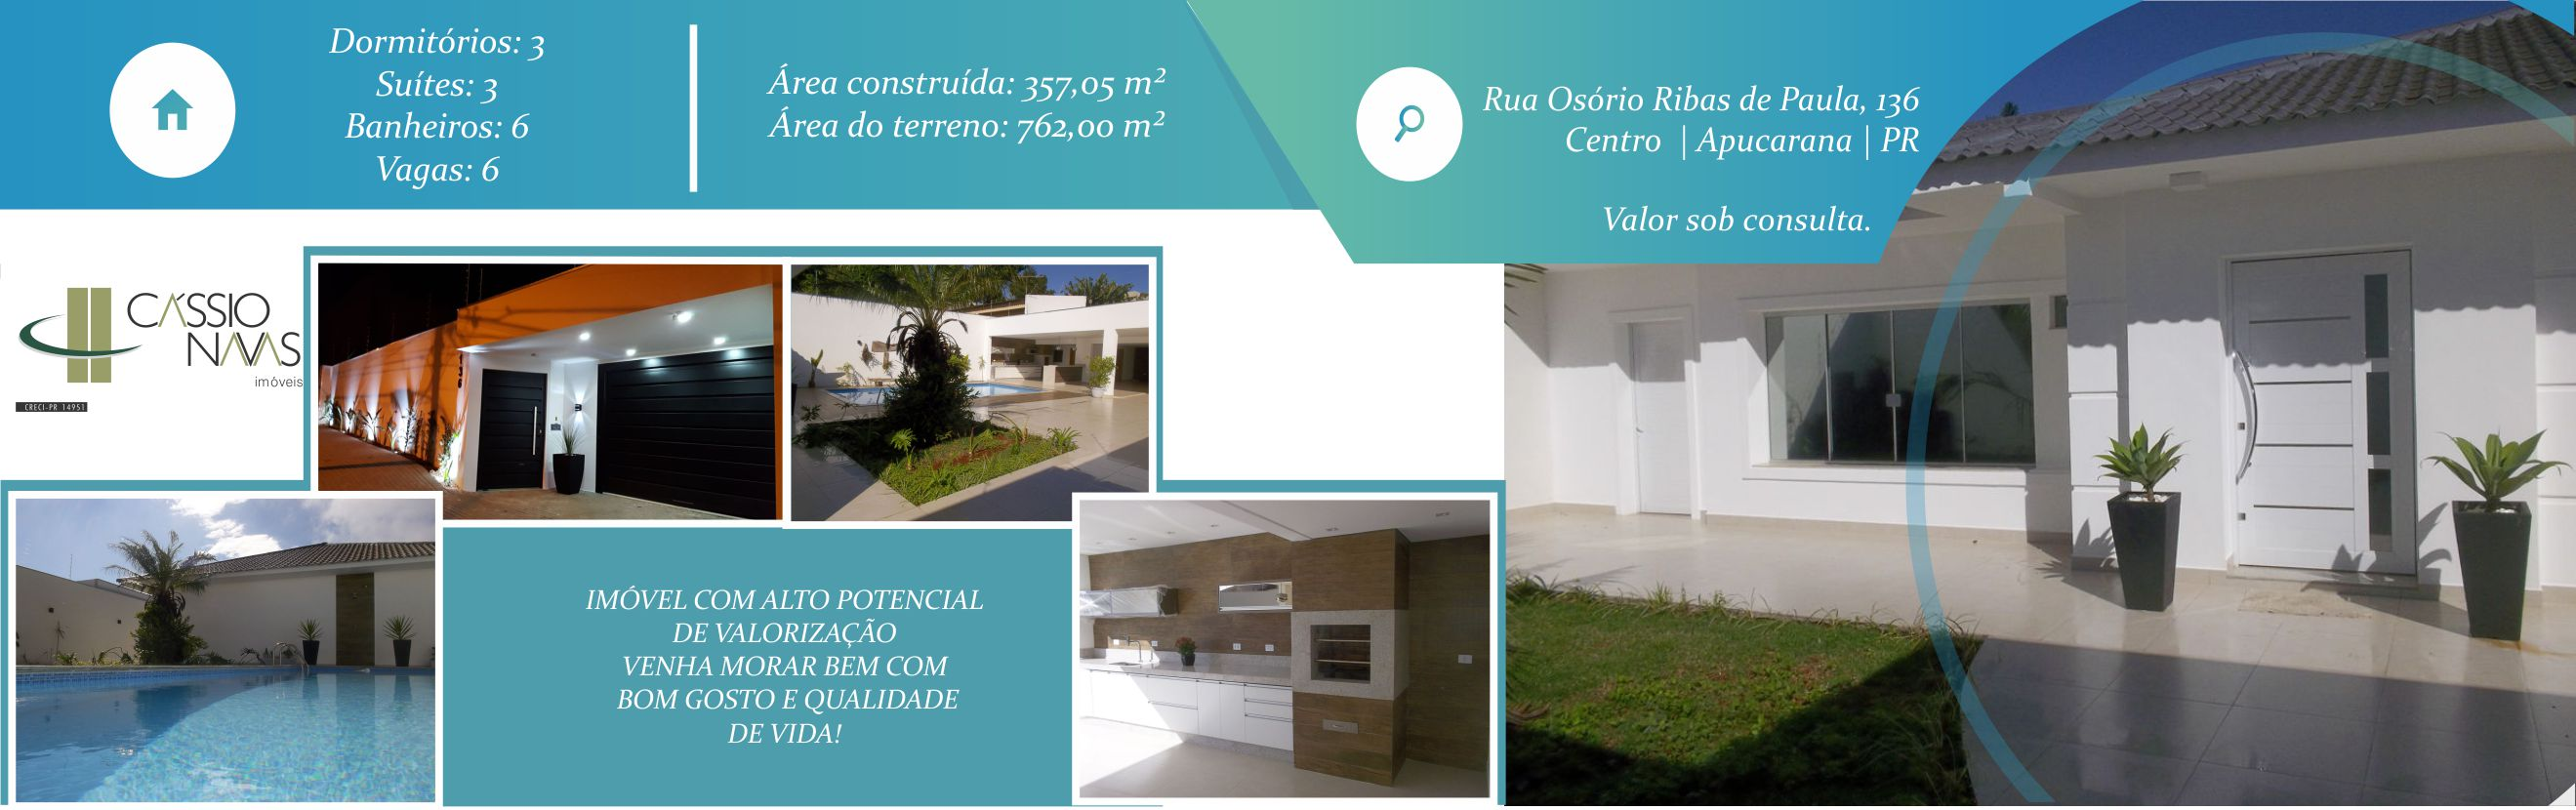 Residência Rua Osório Ribas nº 136